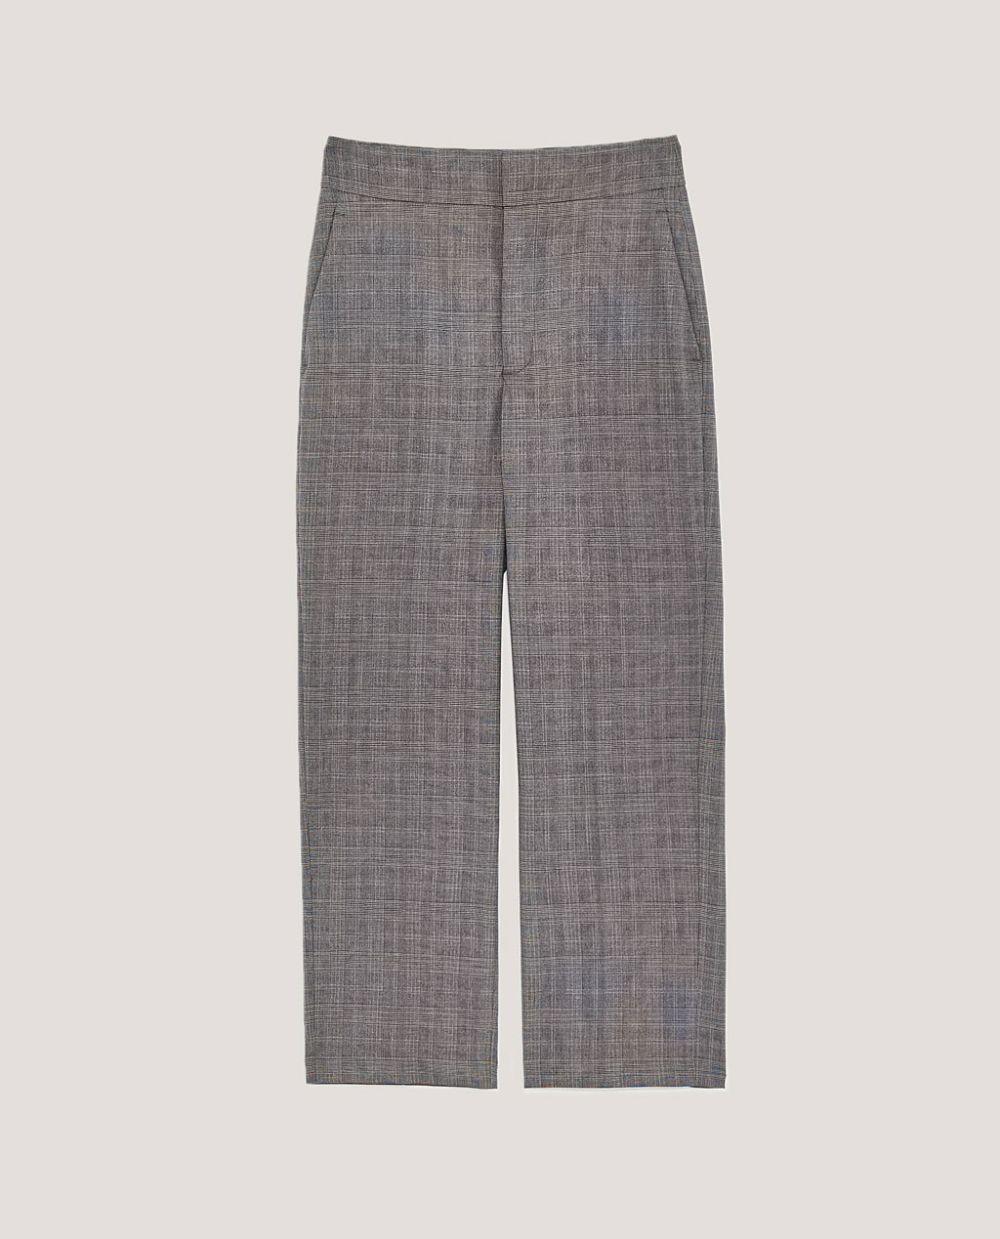 Pantalón sastre por encima del tobillo, Zara (29.99 euros).